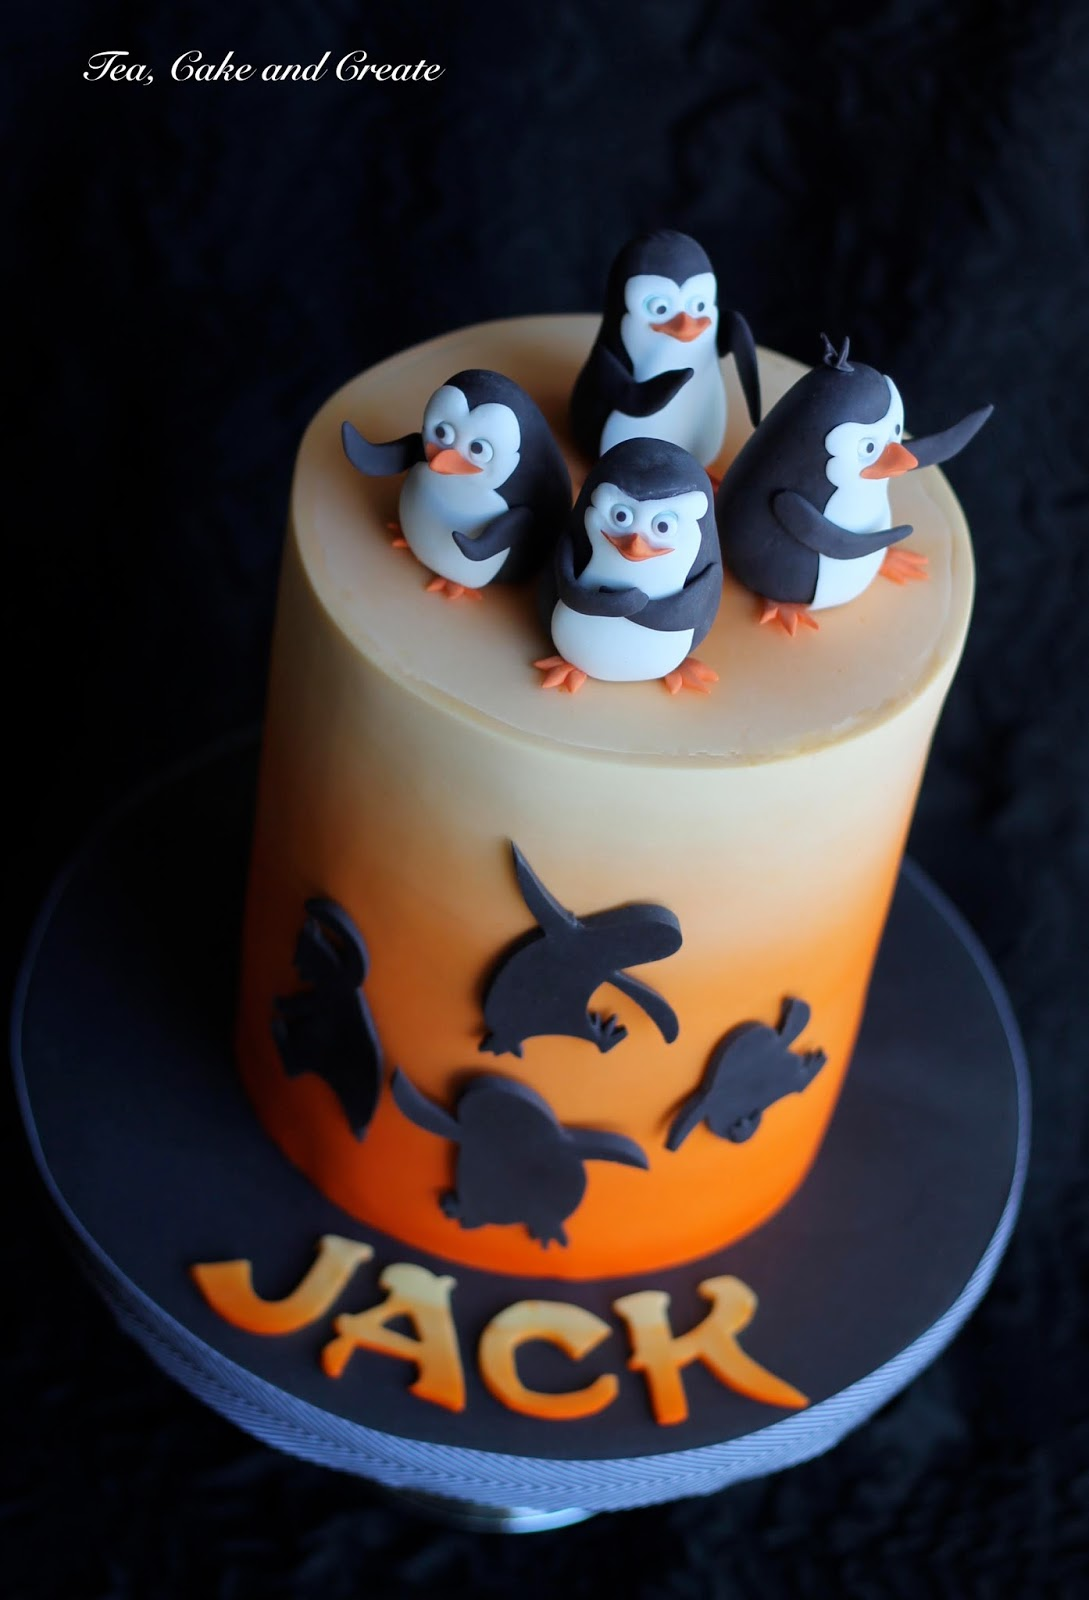 Penguins Of Madagascar Cake Decorating Kit 1 : Tea, Cake & Create: Penguins of Madagascar Birthday Cake